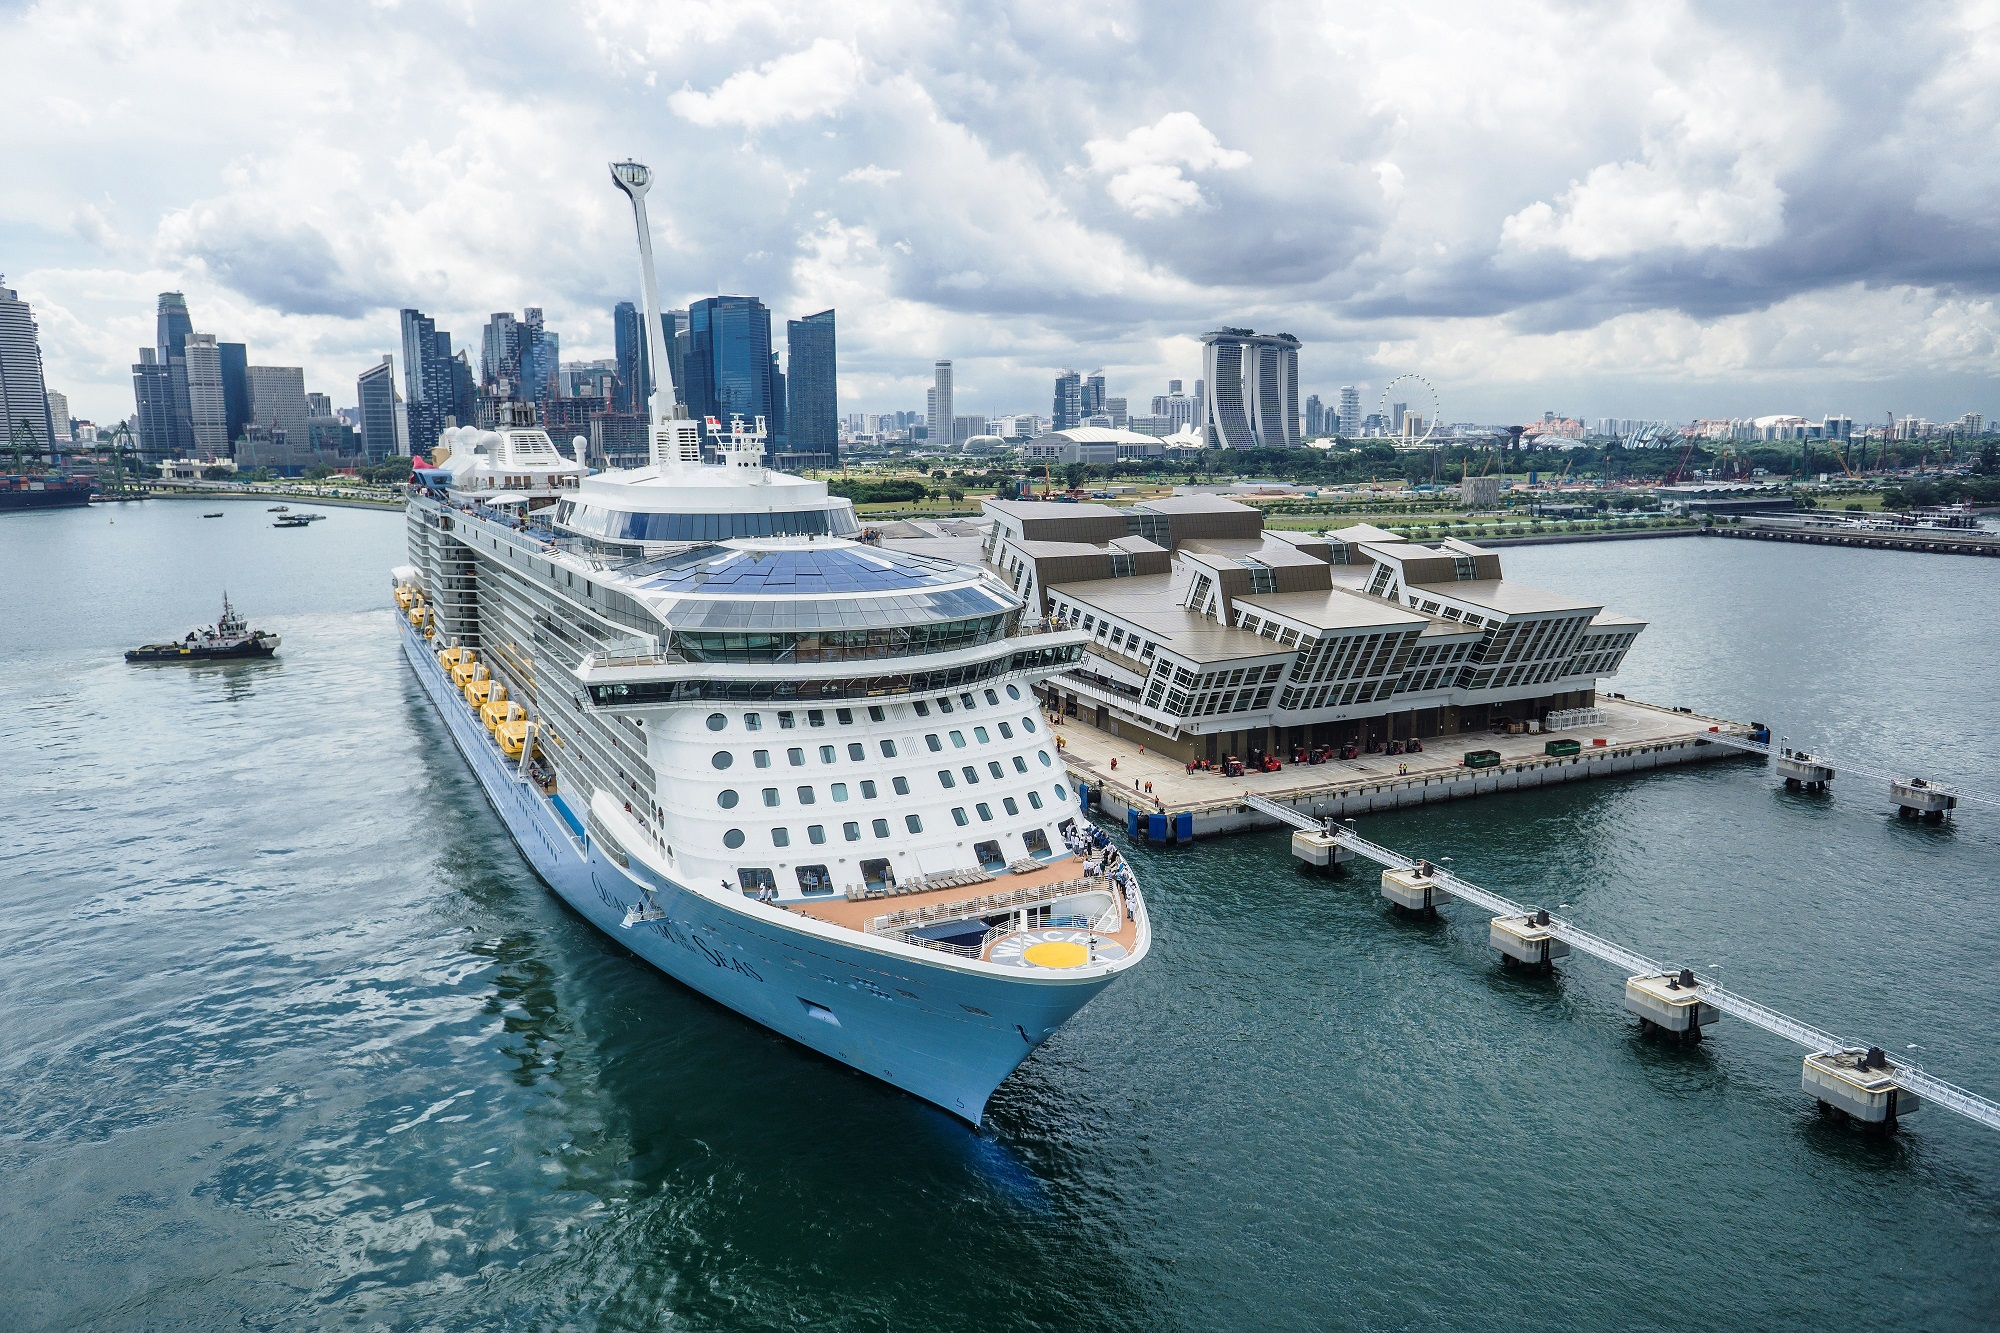 ВОЗОБНОВЛЕНИЕ КРУИЗОВ ИЗ СИНГАПУРА НА QUANTUM OF THE SEAS